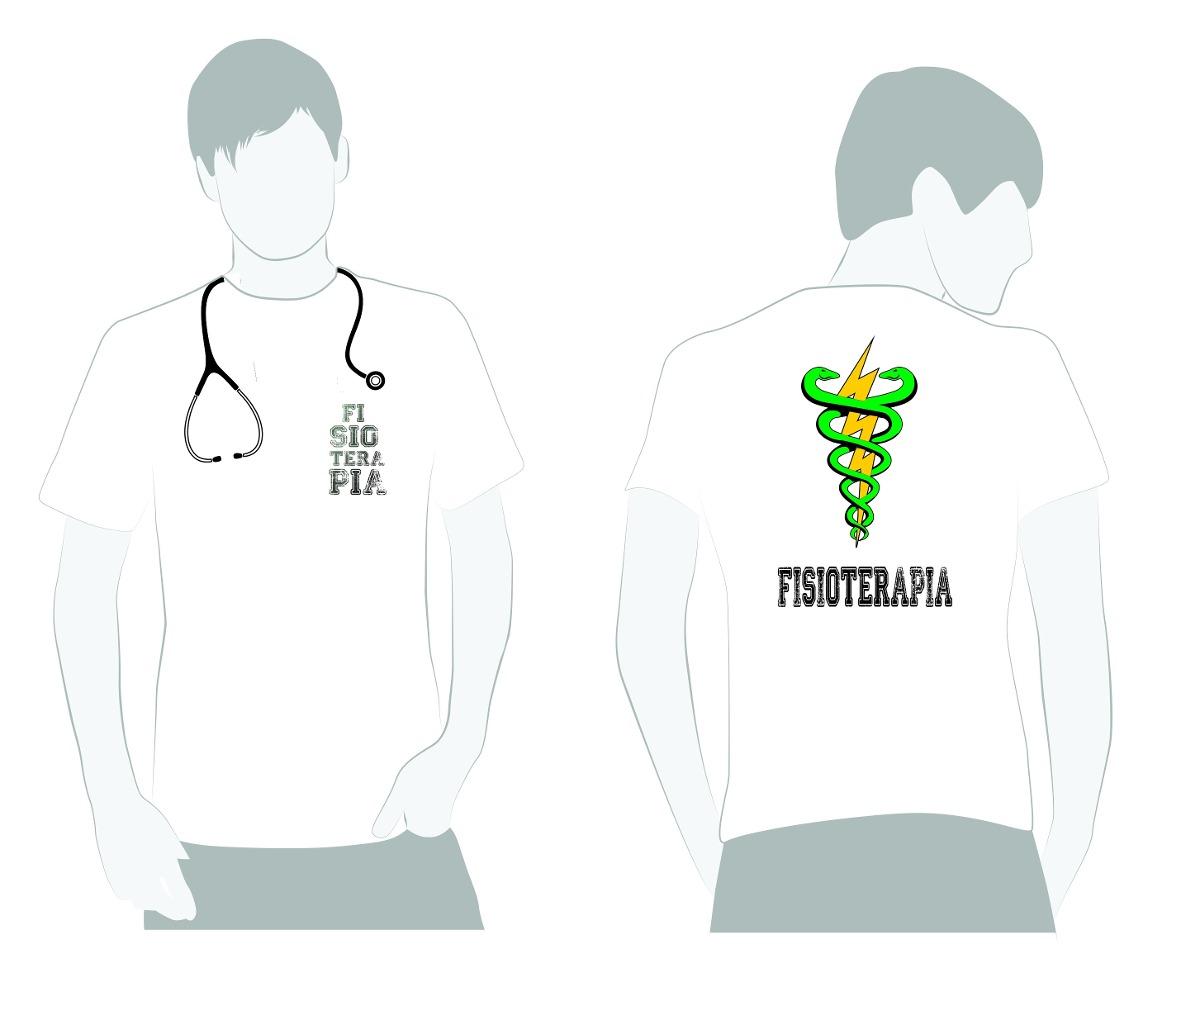 879f2c5693 Camiseta Fisioterapia Estetoscópio R  29 90 em Mercado Livre